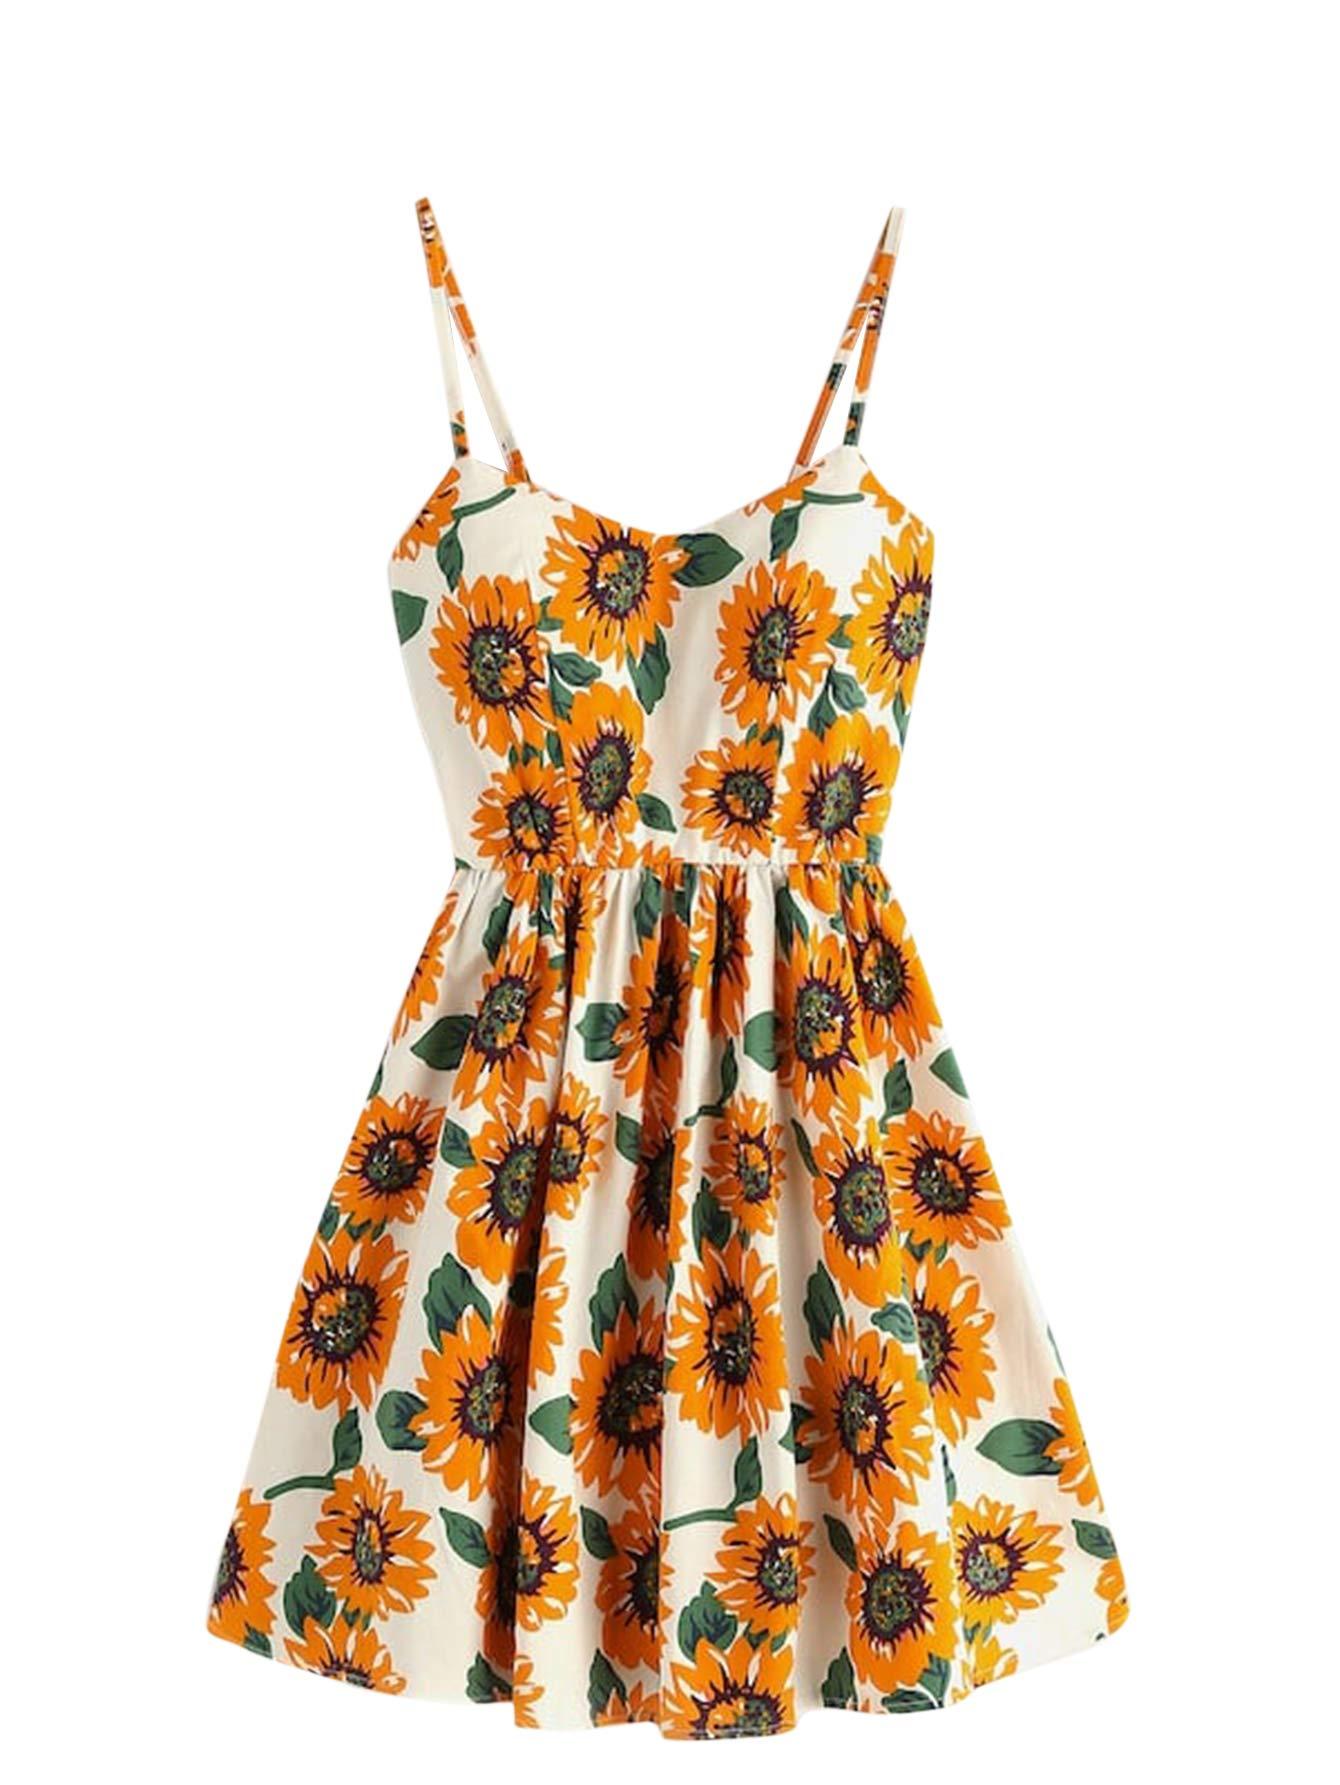 Romwe Women's Cute Summer Sunflower Print Lace Up Back Boho Swing Spaghetti Strap Cami Dress